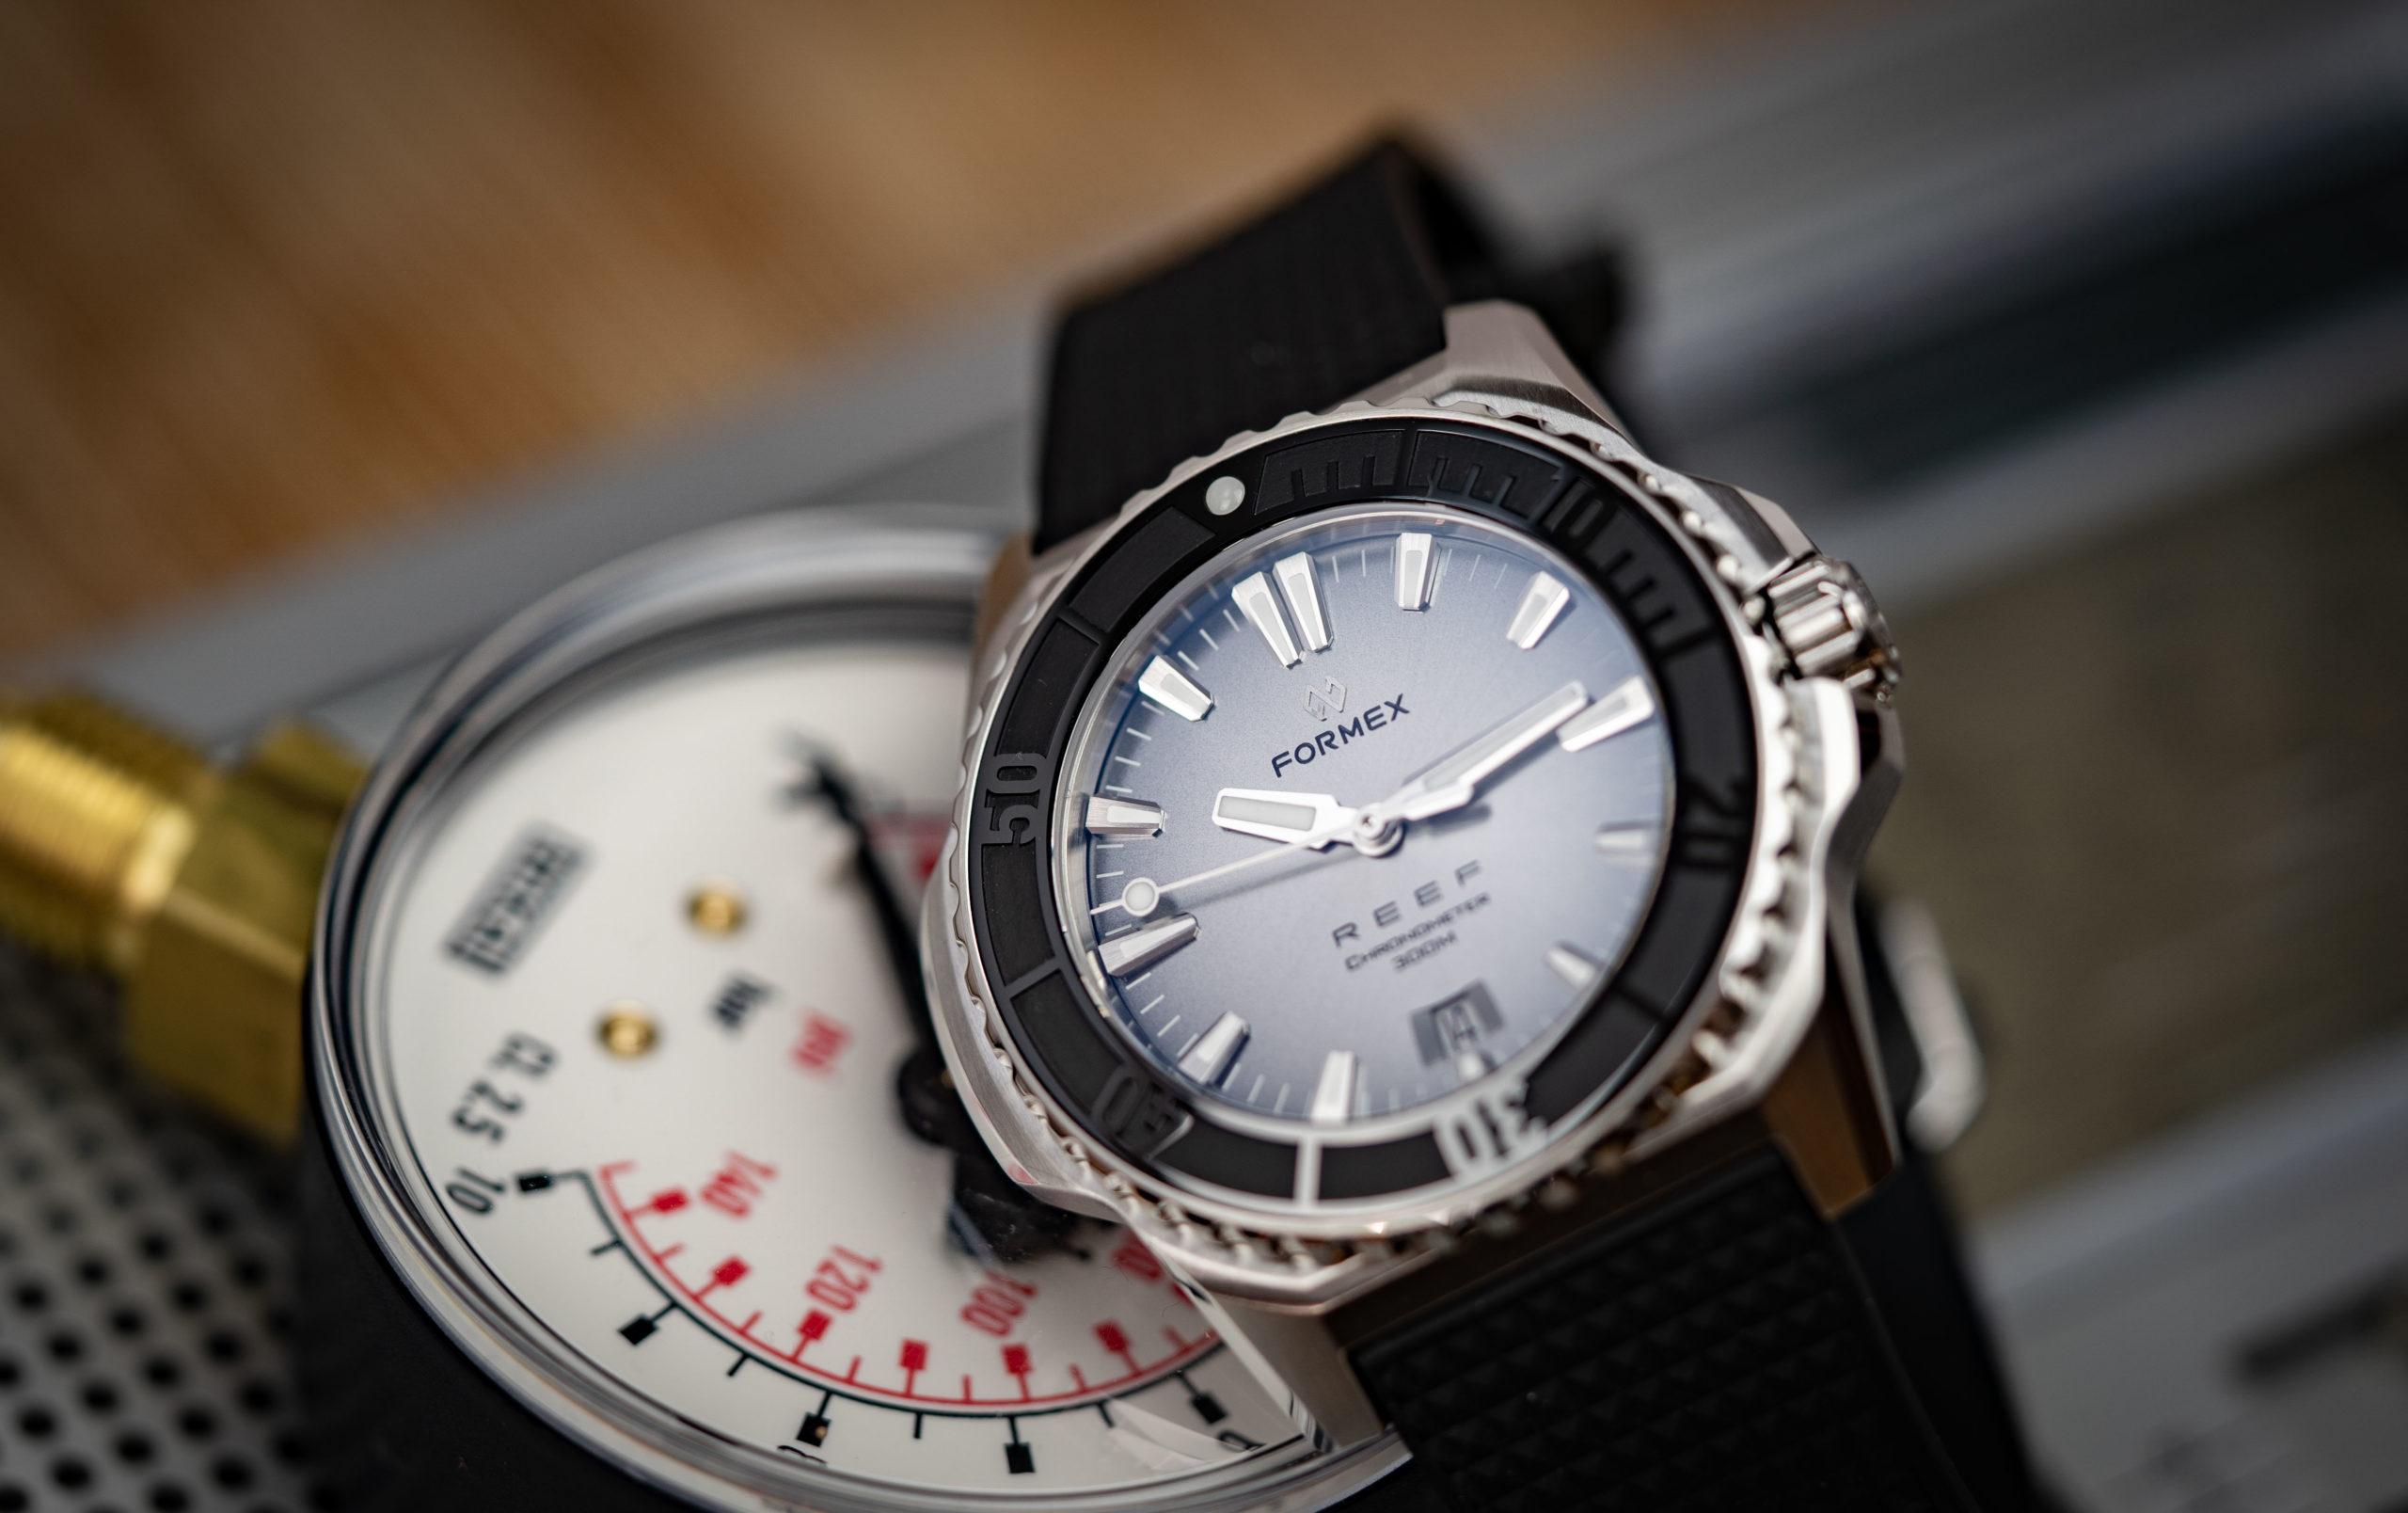 Formex-Reef-Automatik-Chronometer-300m-Hands-On